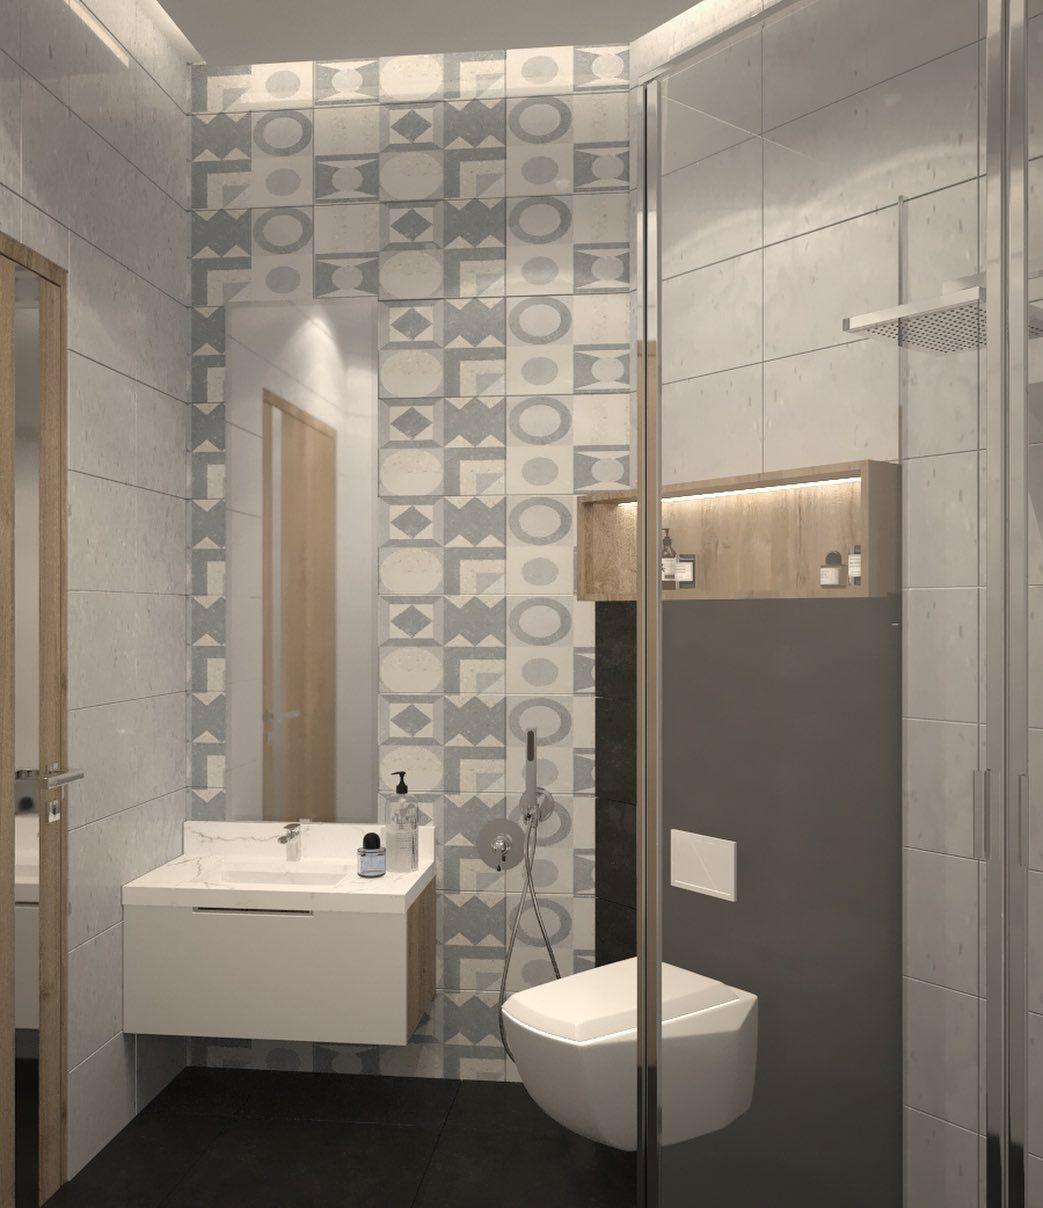 تصميم وتنفيذ حمام واجهات مطابخ حمامات صالات Natureinspire Colorpalette Colorscheme ديكورات داخليه تصوير P Framed Bathroom Mirror Bathroom Mirror Mirror